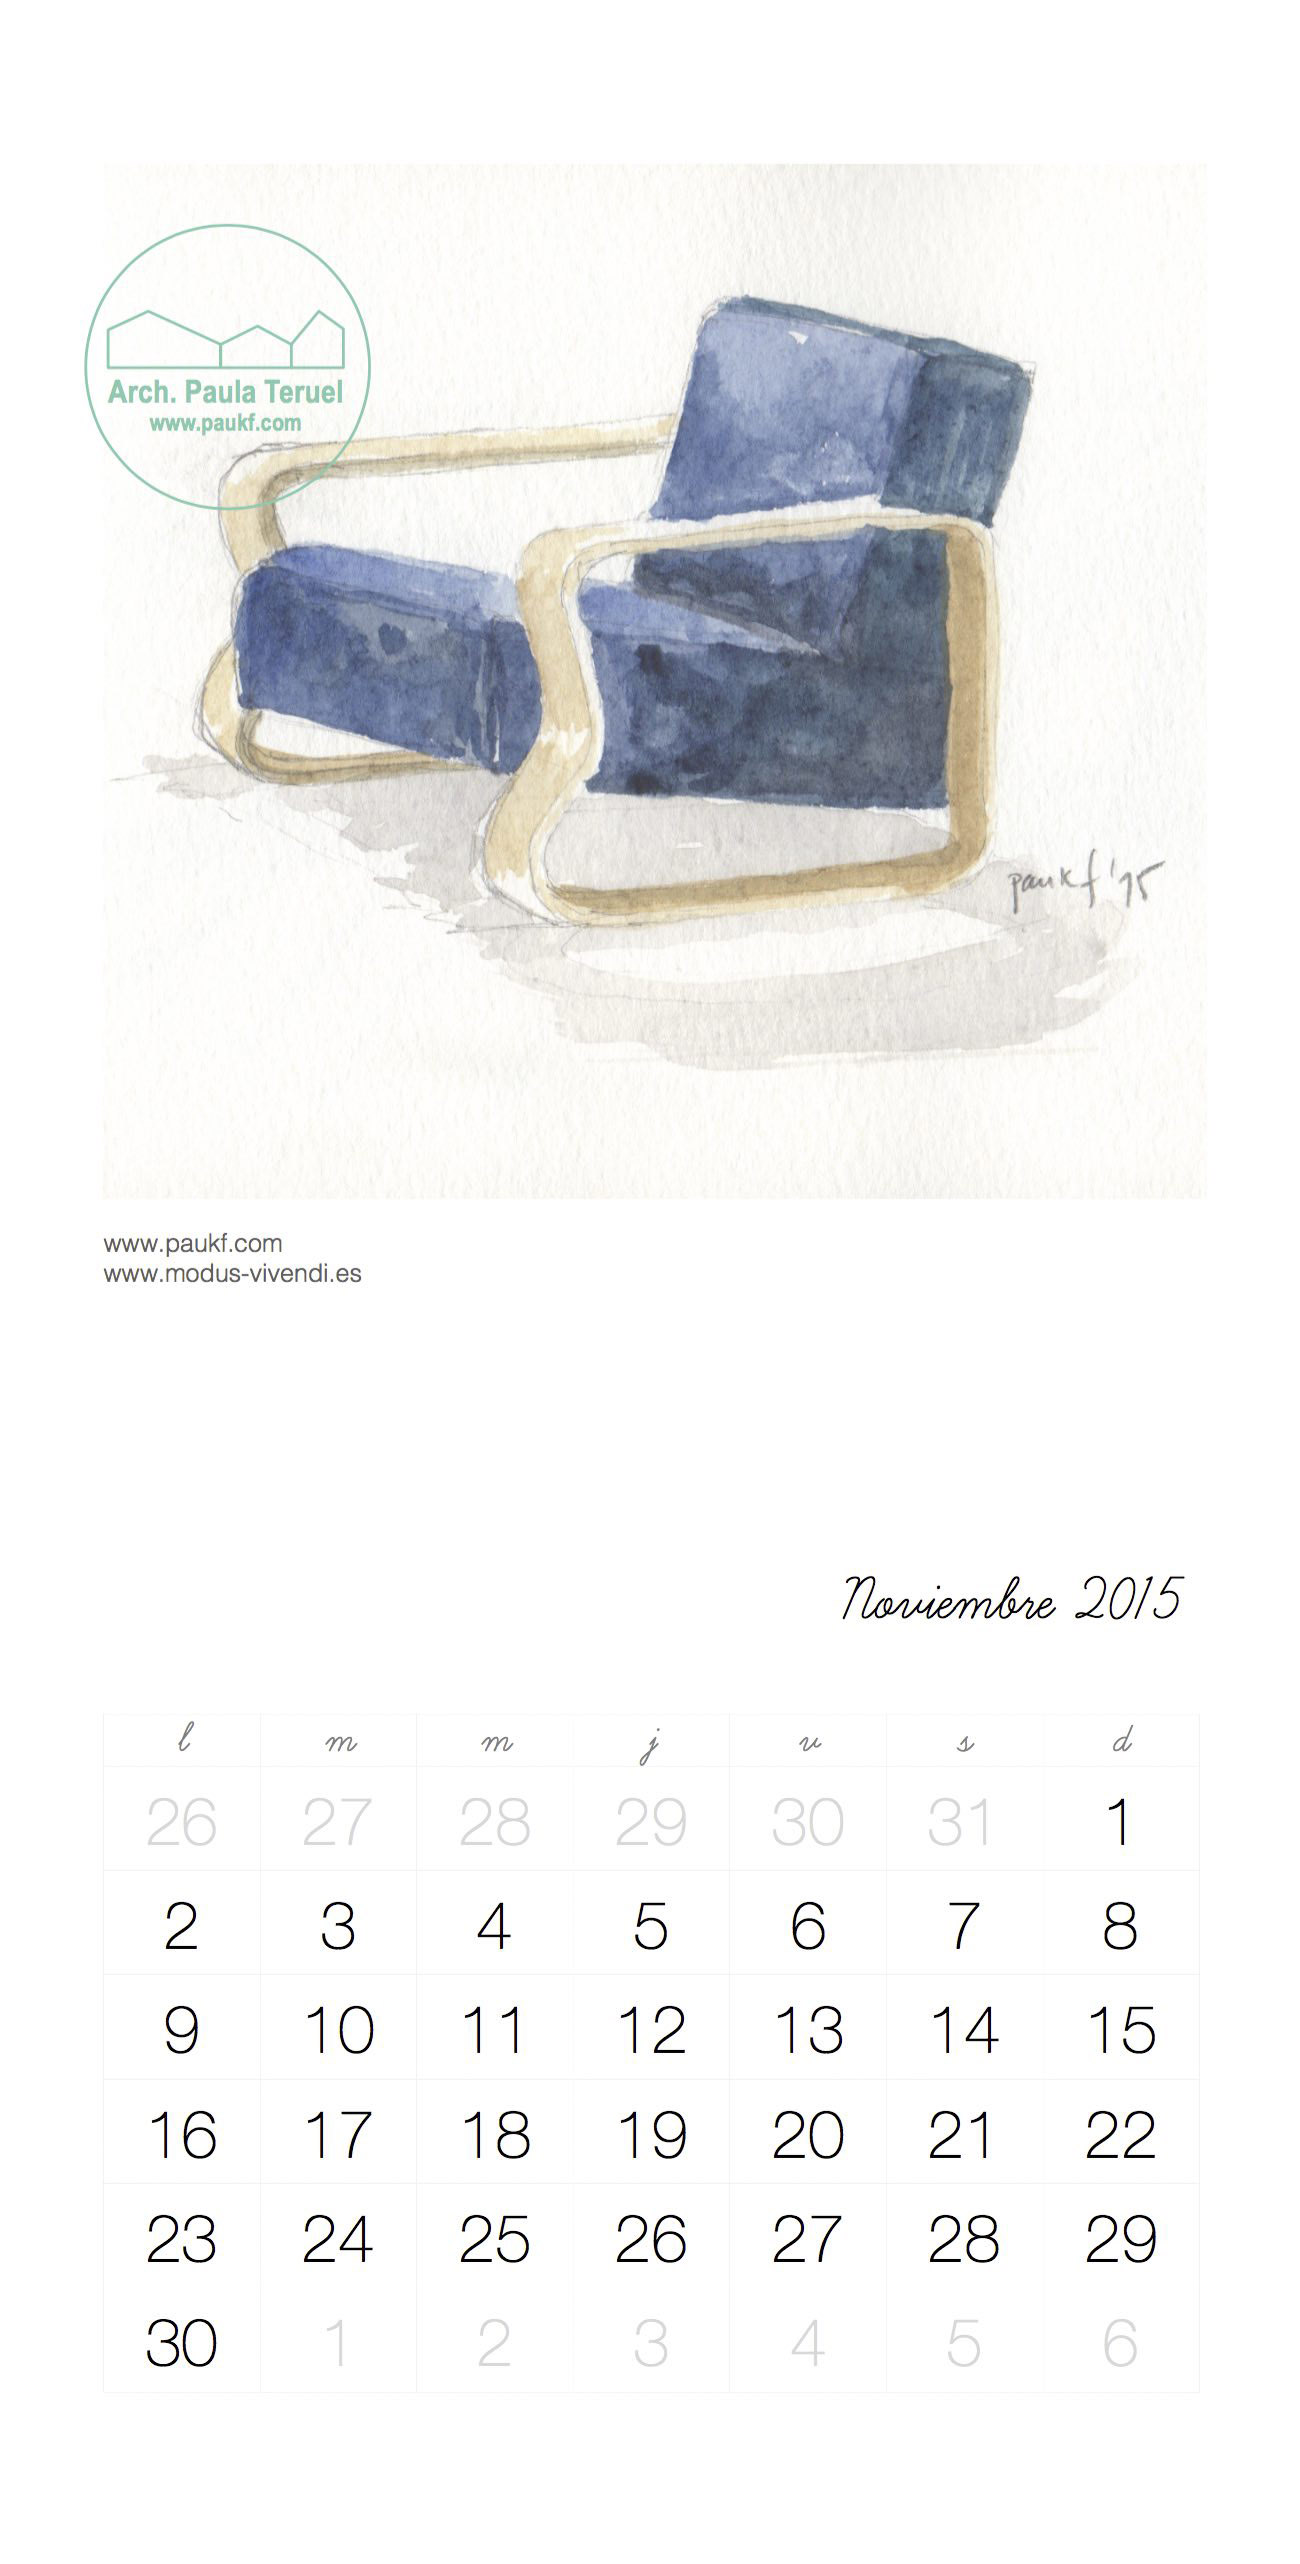 November calendar Noviembre Calendario acuarela paukf watercolor modus vivendi arquitectura Alvar Aalto architecture design chair silla